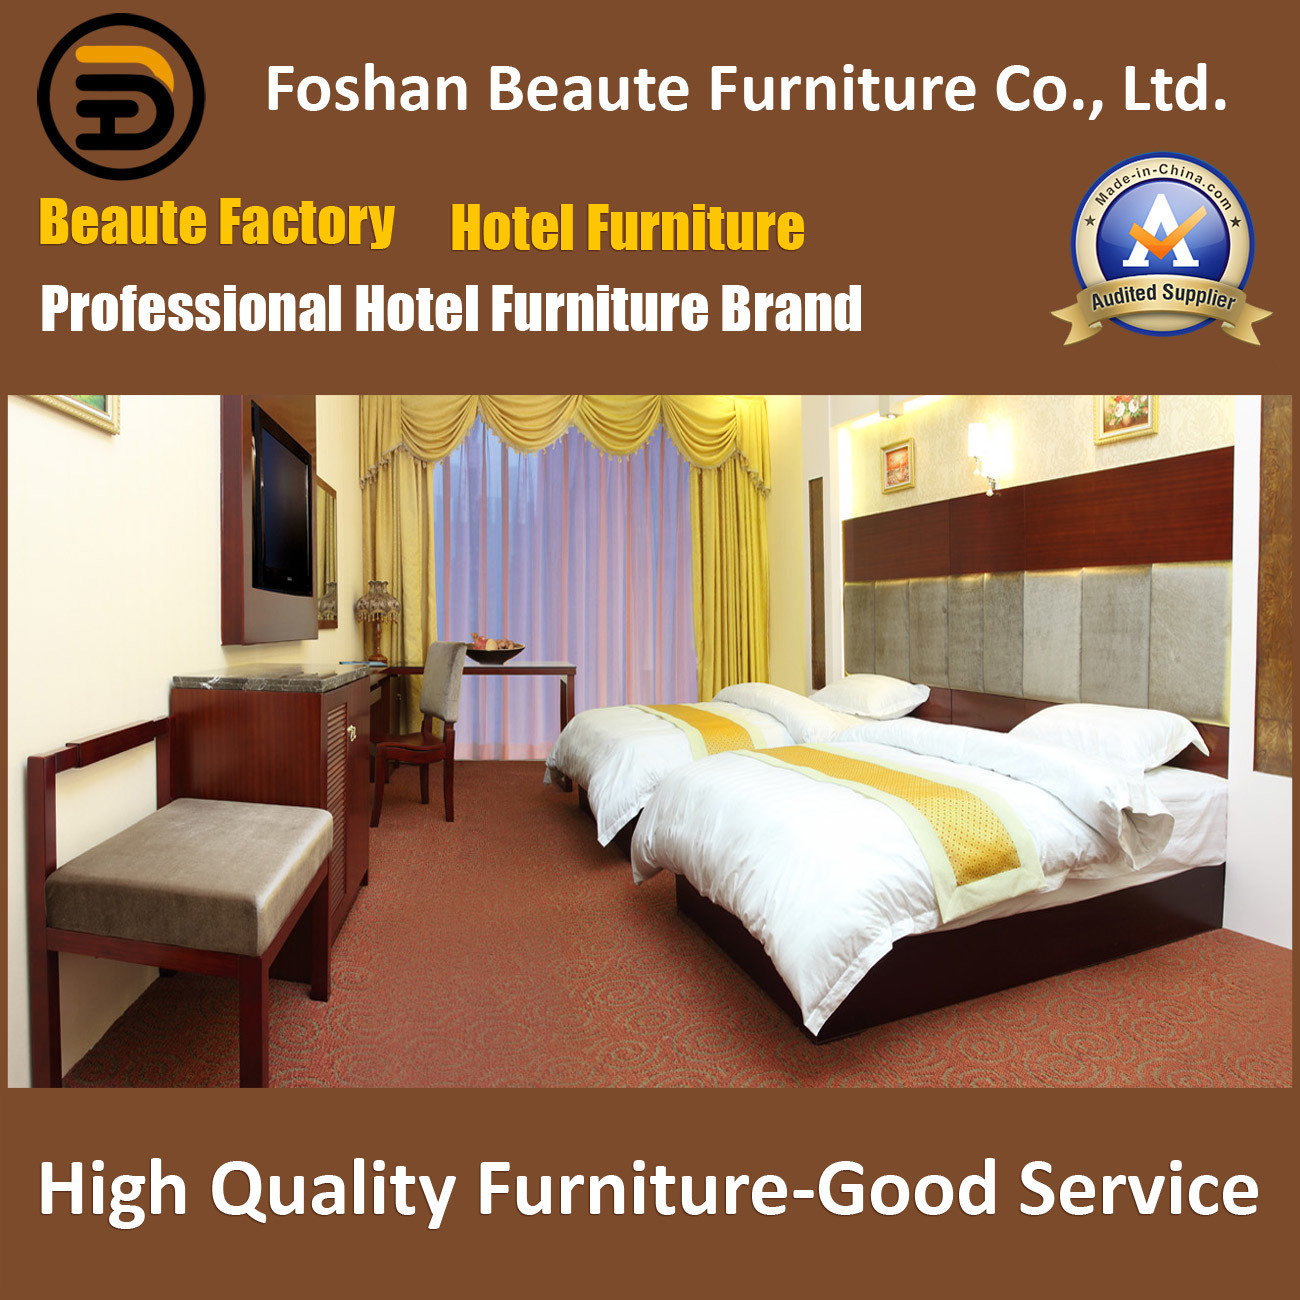 Hotel Furniture/Luxury Double Bedroom Furniture/Standard Hotel Double Bedroom Suite/Double Hospitality Guest Room Furniture (GLB-0109871)